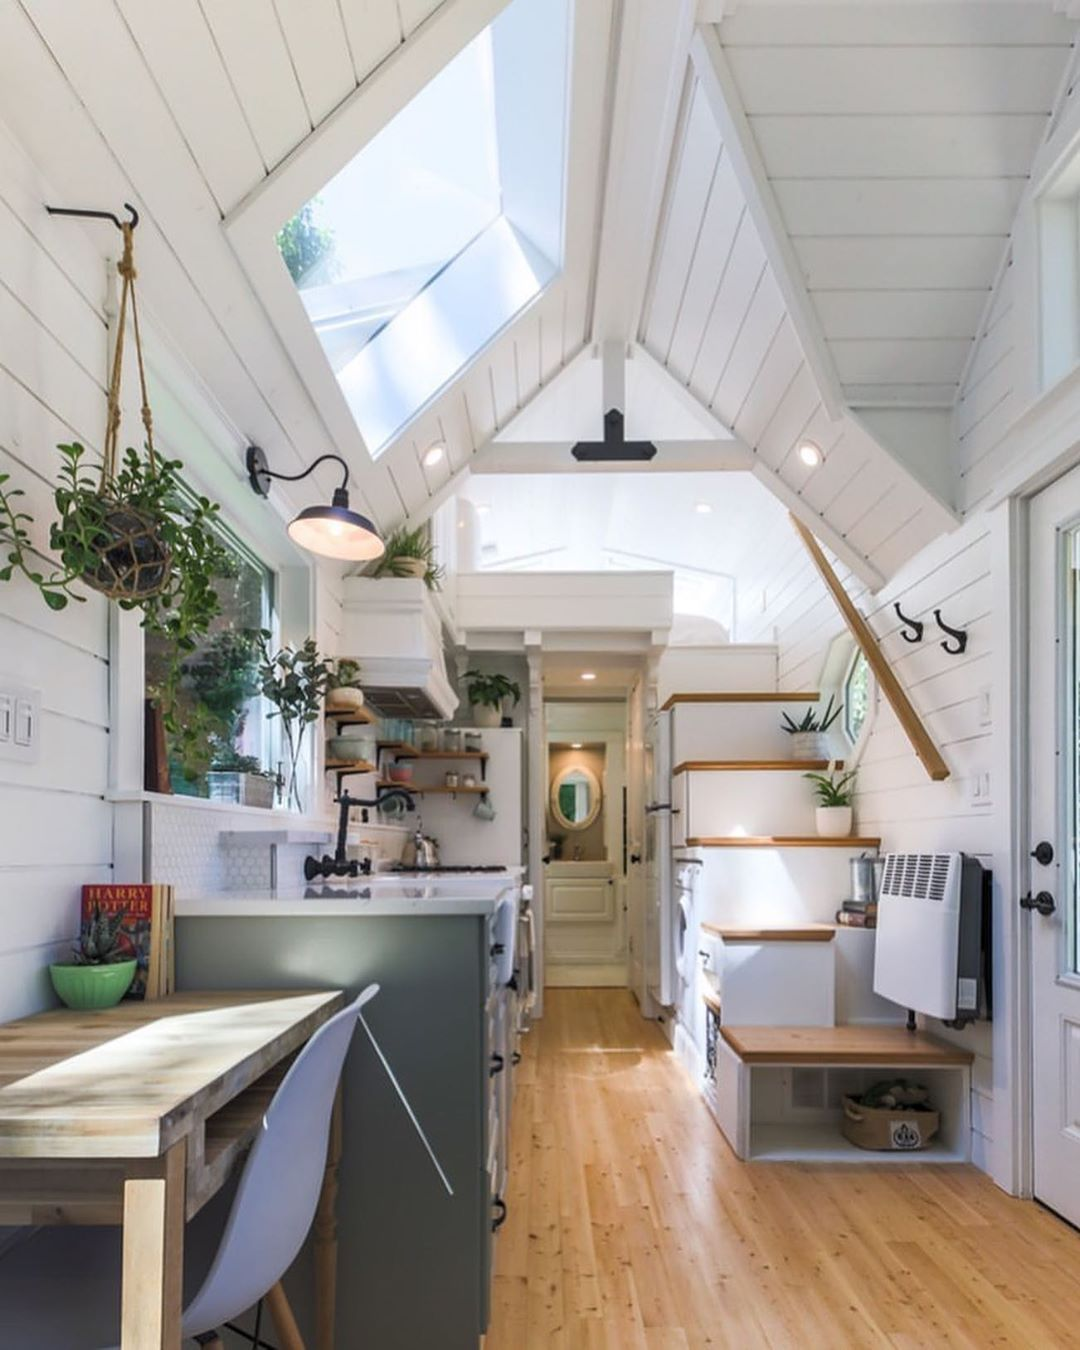 Tiny Homes Sur Instagram Follow Us Tinyhomes For More Tiny Home Inspo Such A Dream Tiny Tiny House Interior Tiny House Living Modern Tiny House